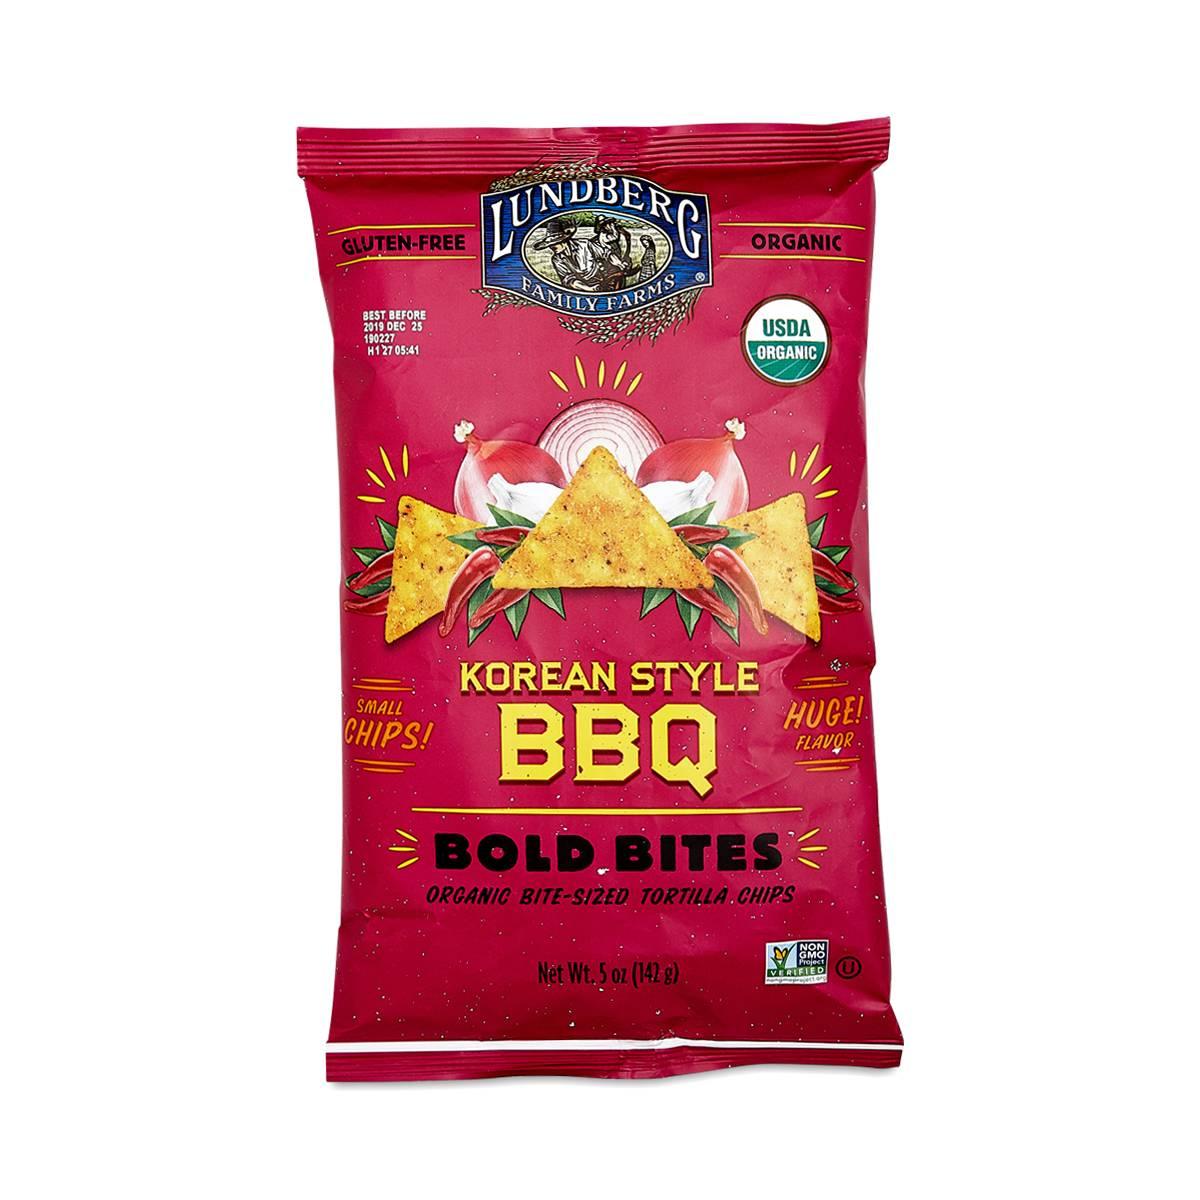 Lundberg Family Farms Korean Style BBQ Bold Bites Tortilla Chips - Thrive Market